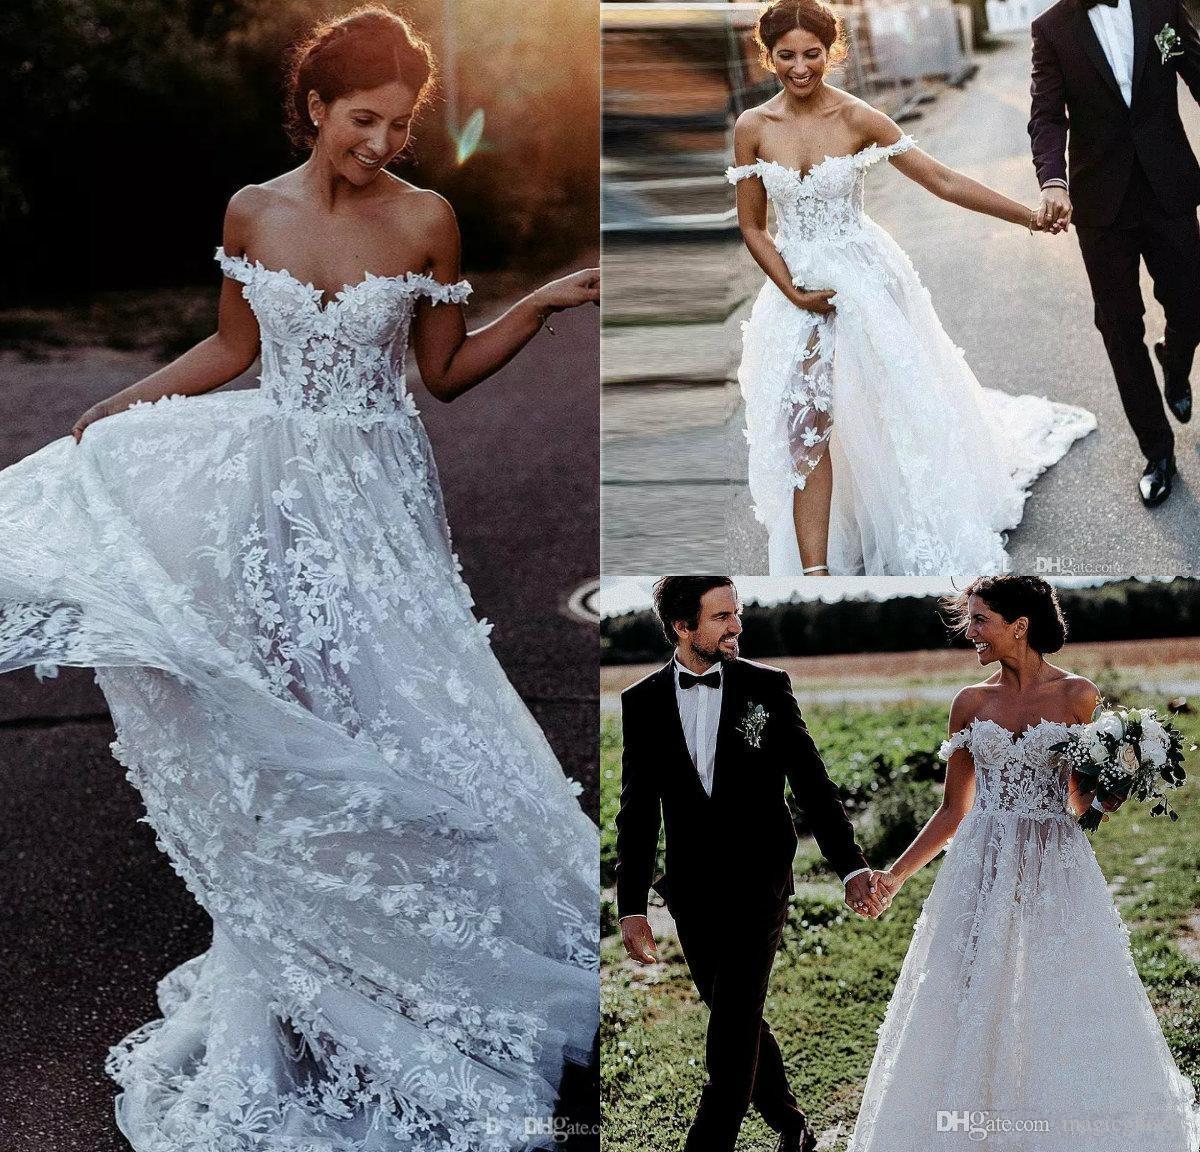 2019 Bohemian Wedding Dresses Off The Shoulder Lace 3D Floral Appliques A Line Beach Wedding Dress Sweep Train Cheap Bhoh Bridal Gowns